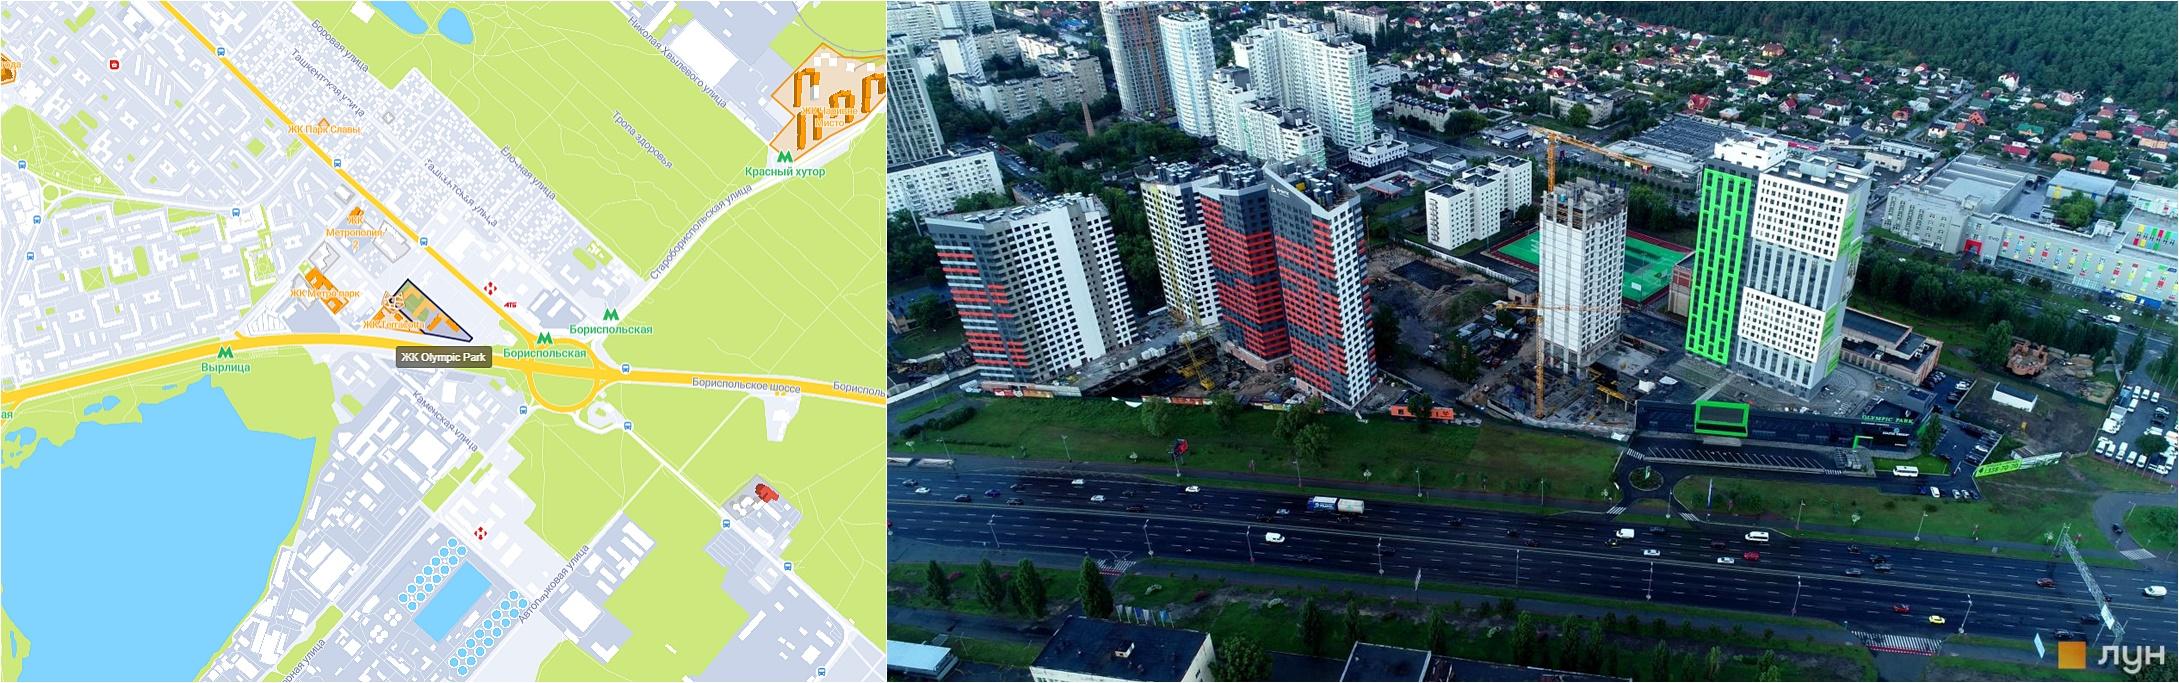 ЖК Олимпик Парк на карте и аэрооблет